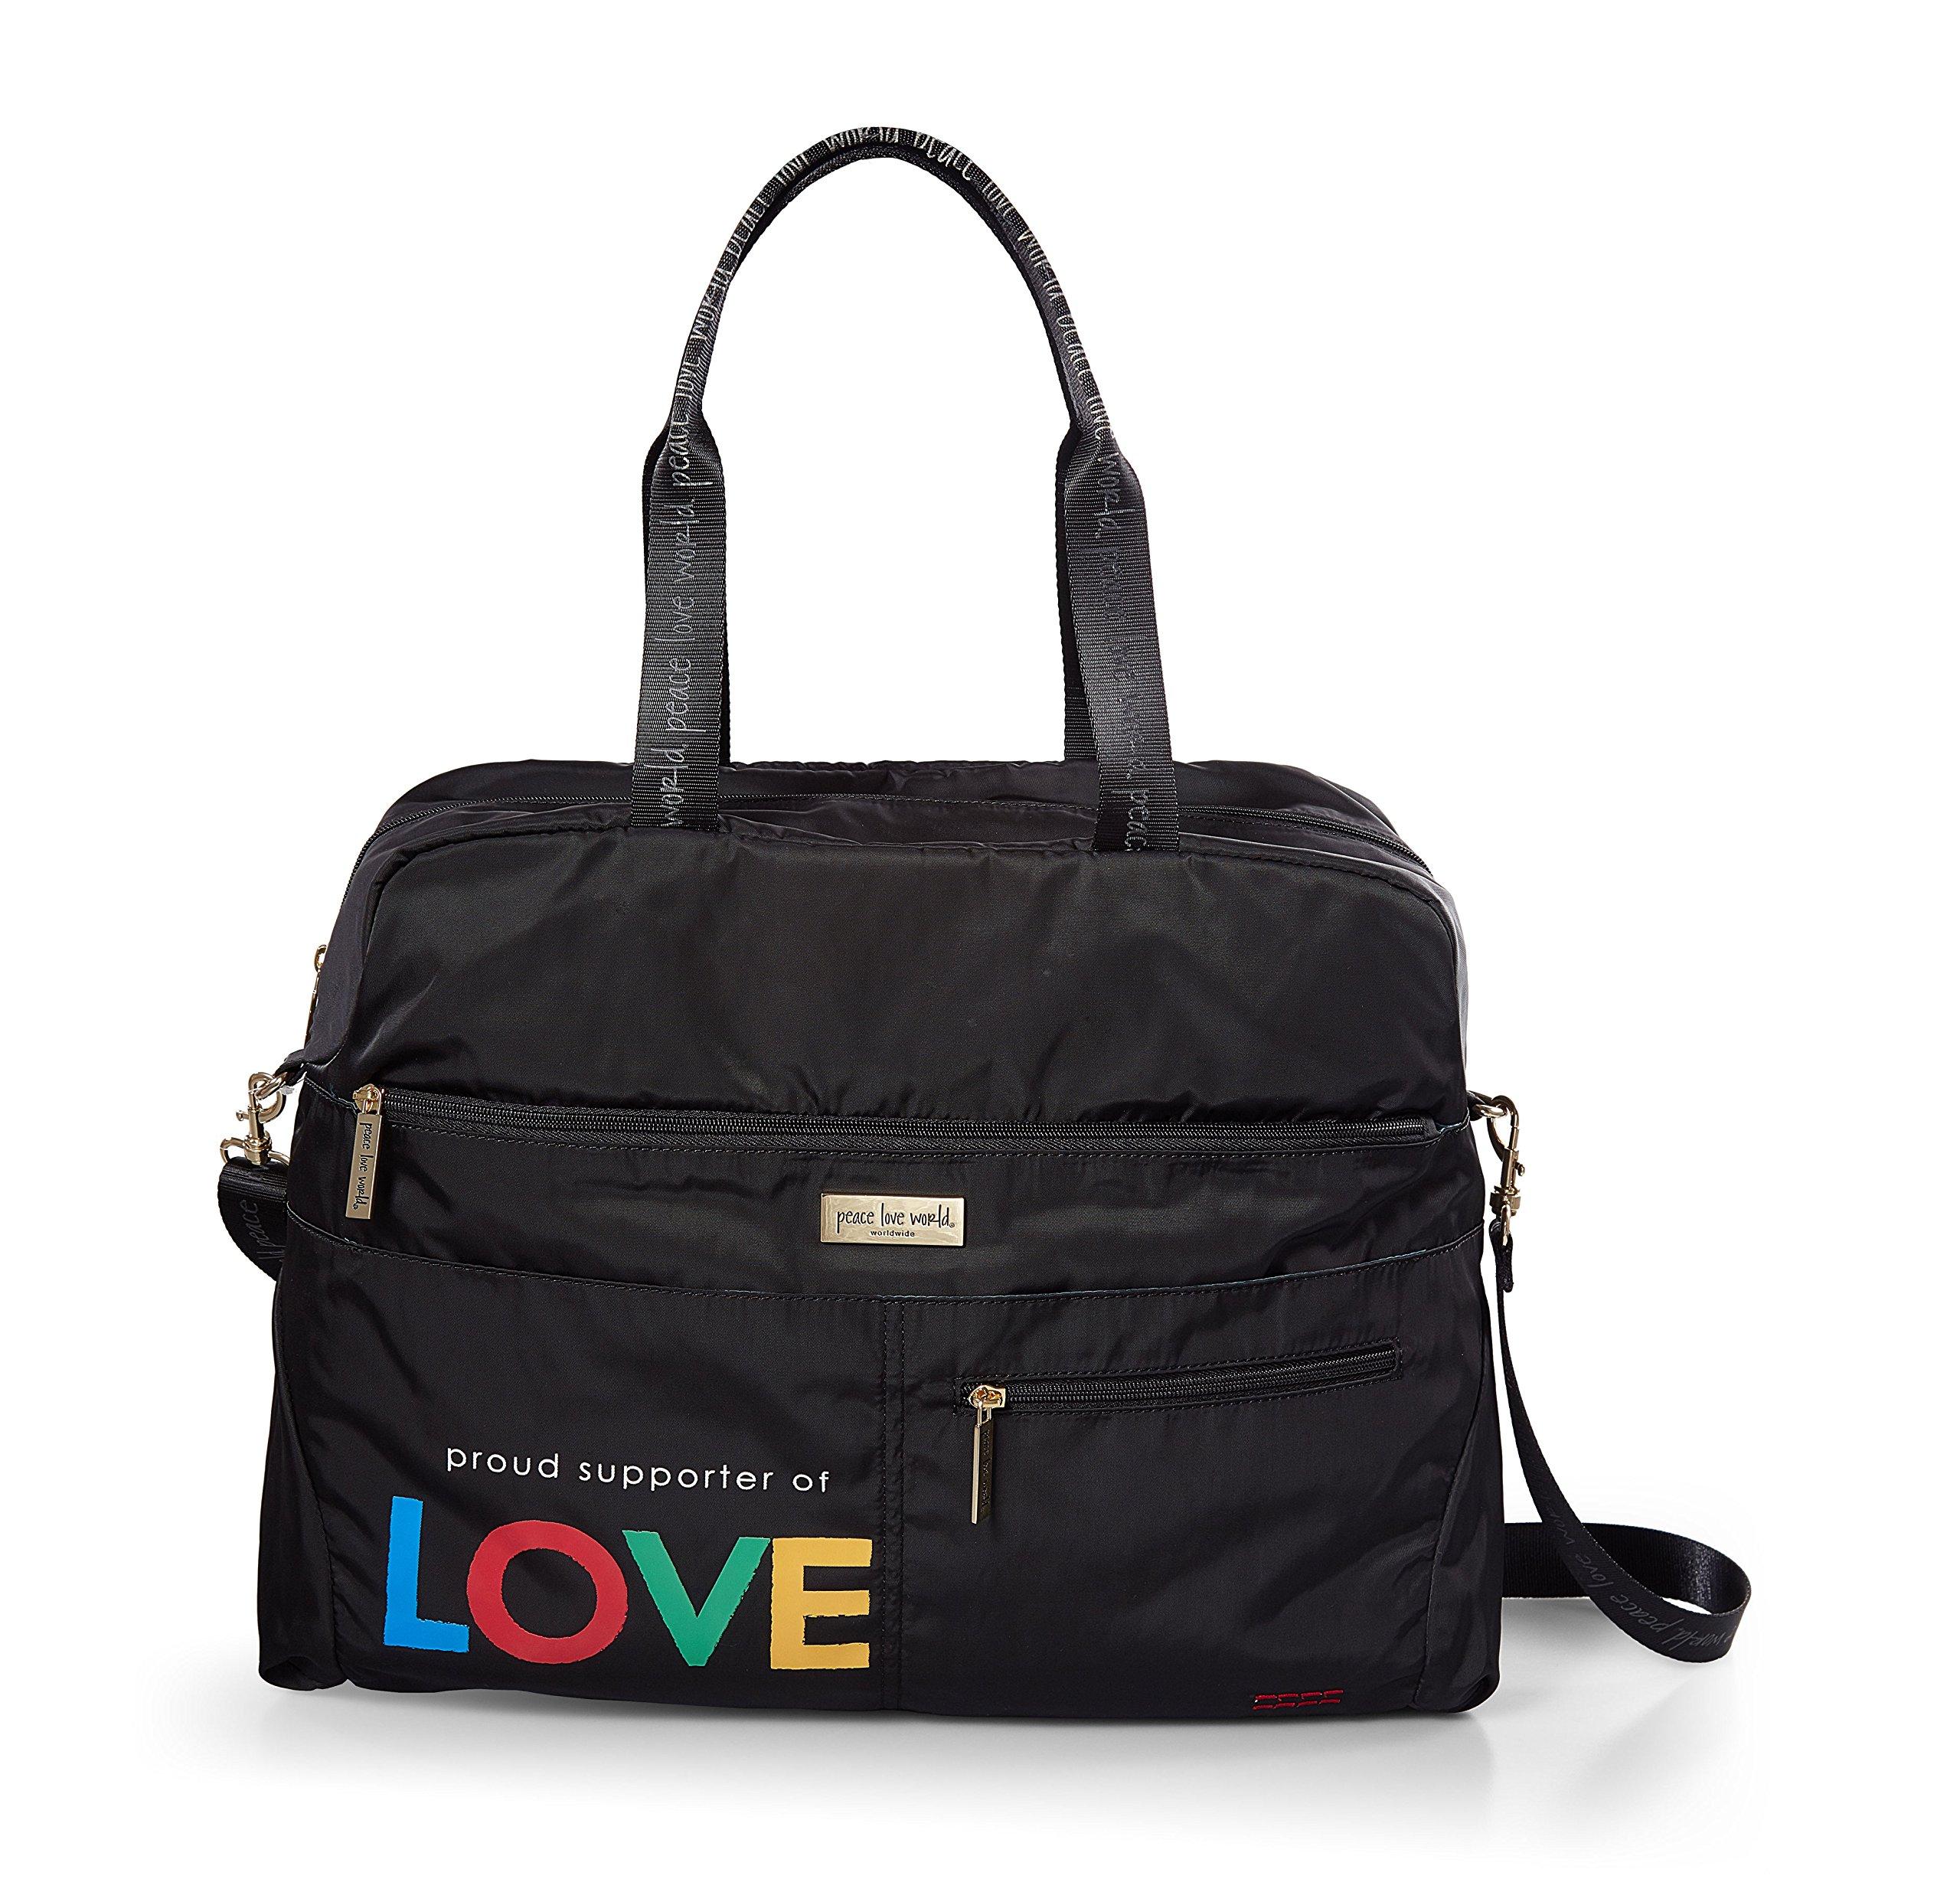 Peace Love World Duffle Bag Crossbody bag PLW200 Black (Black)